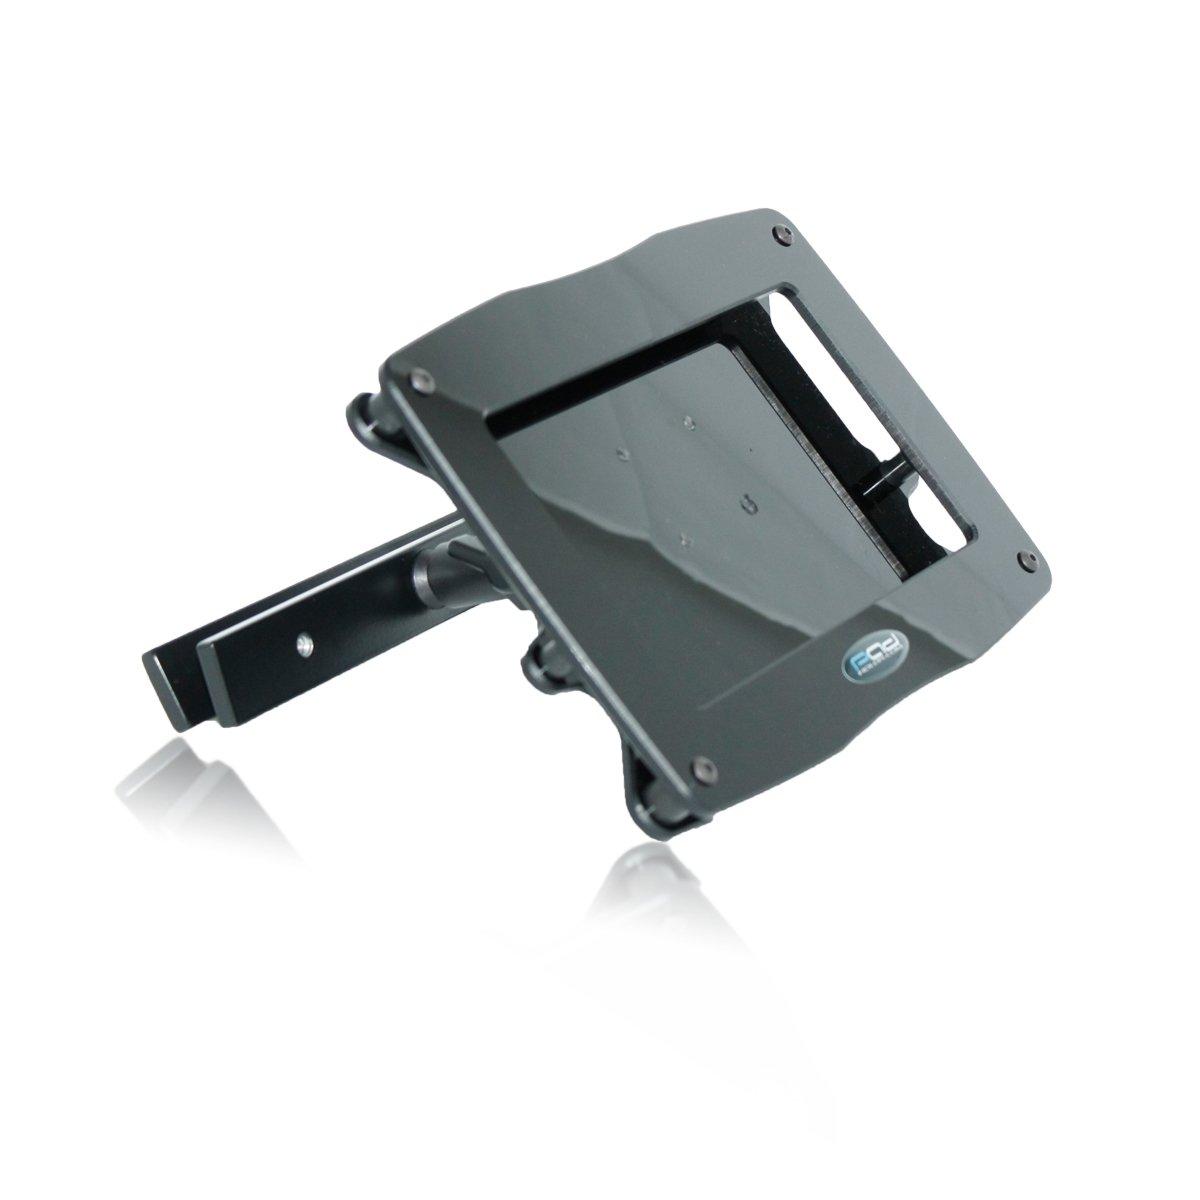 Padholdr Fit Small Series Tablet Holder Headrest Mount (PHFSHRB)